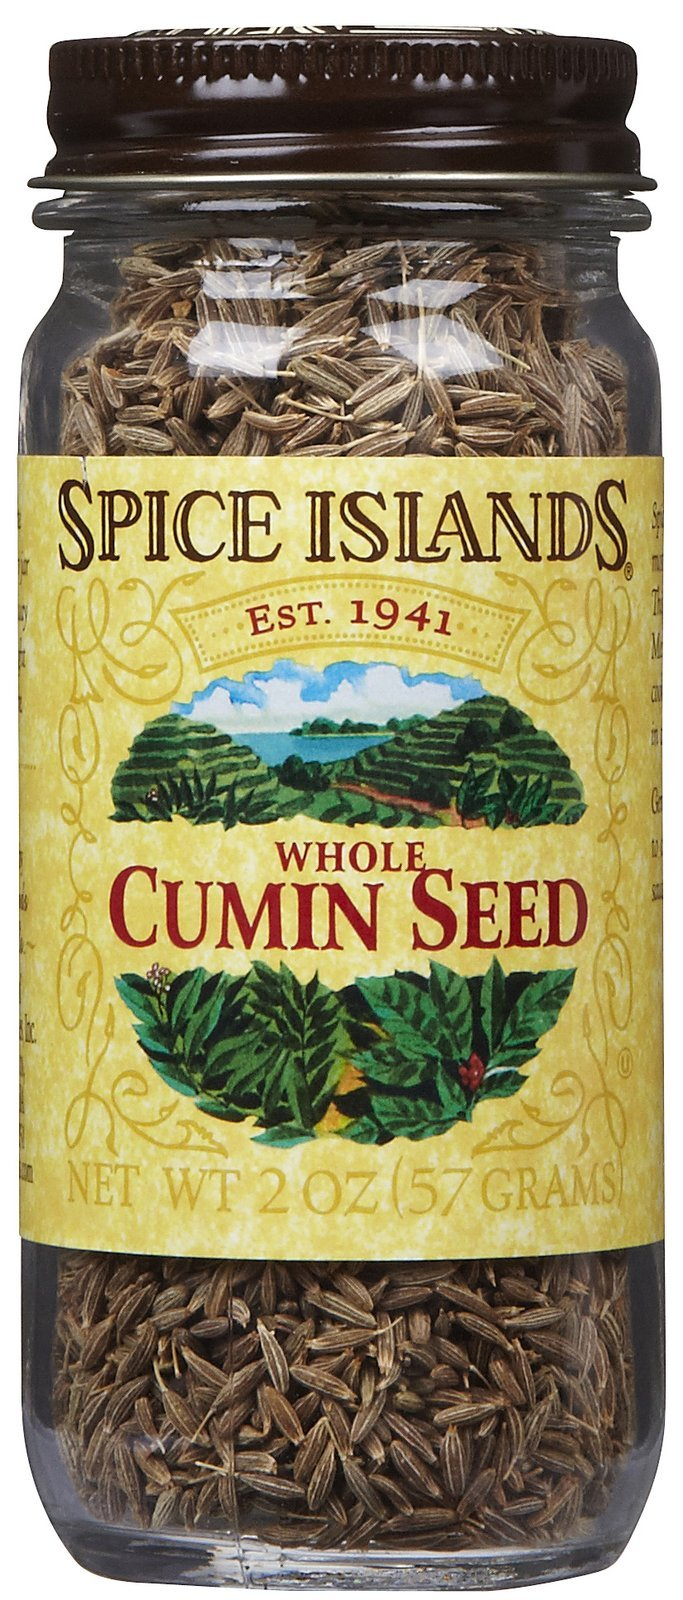 Spice Island Whole Cumin Seed, 2 oz